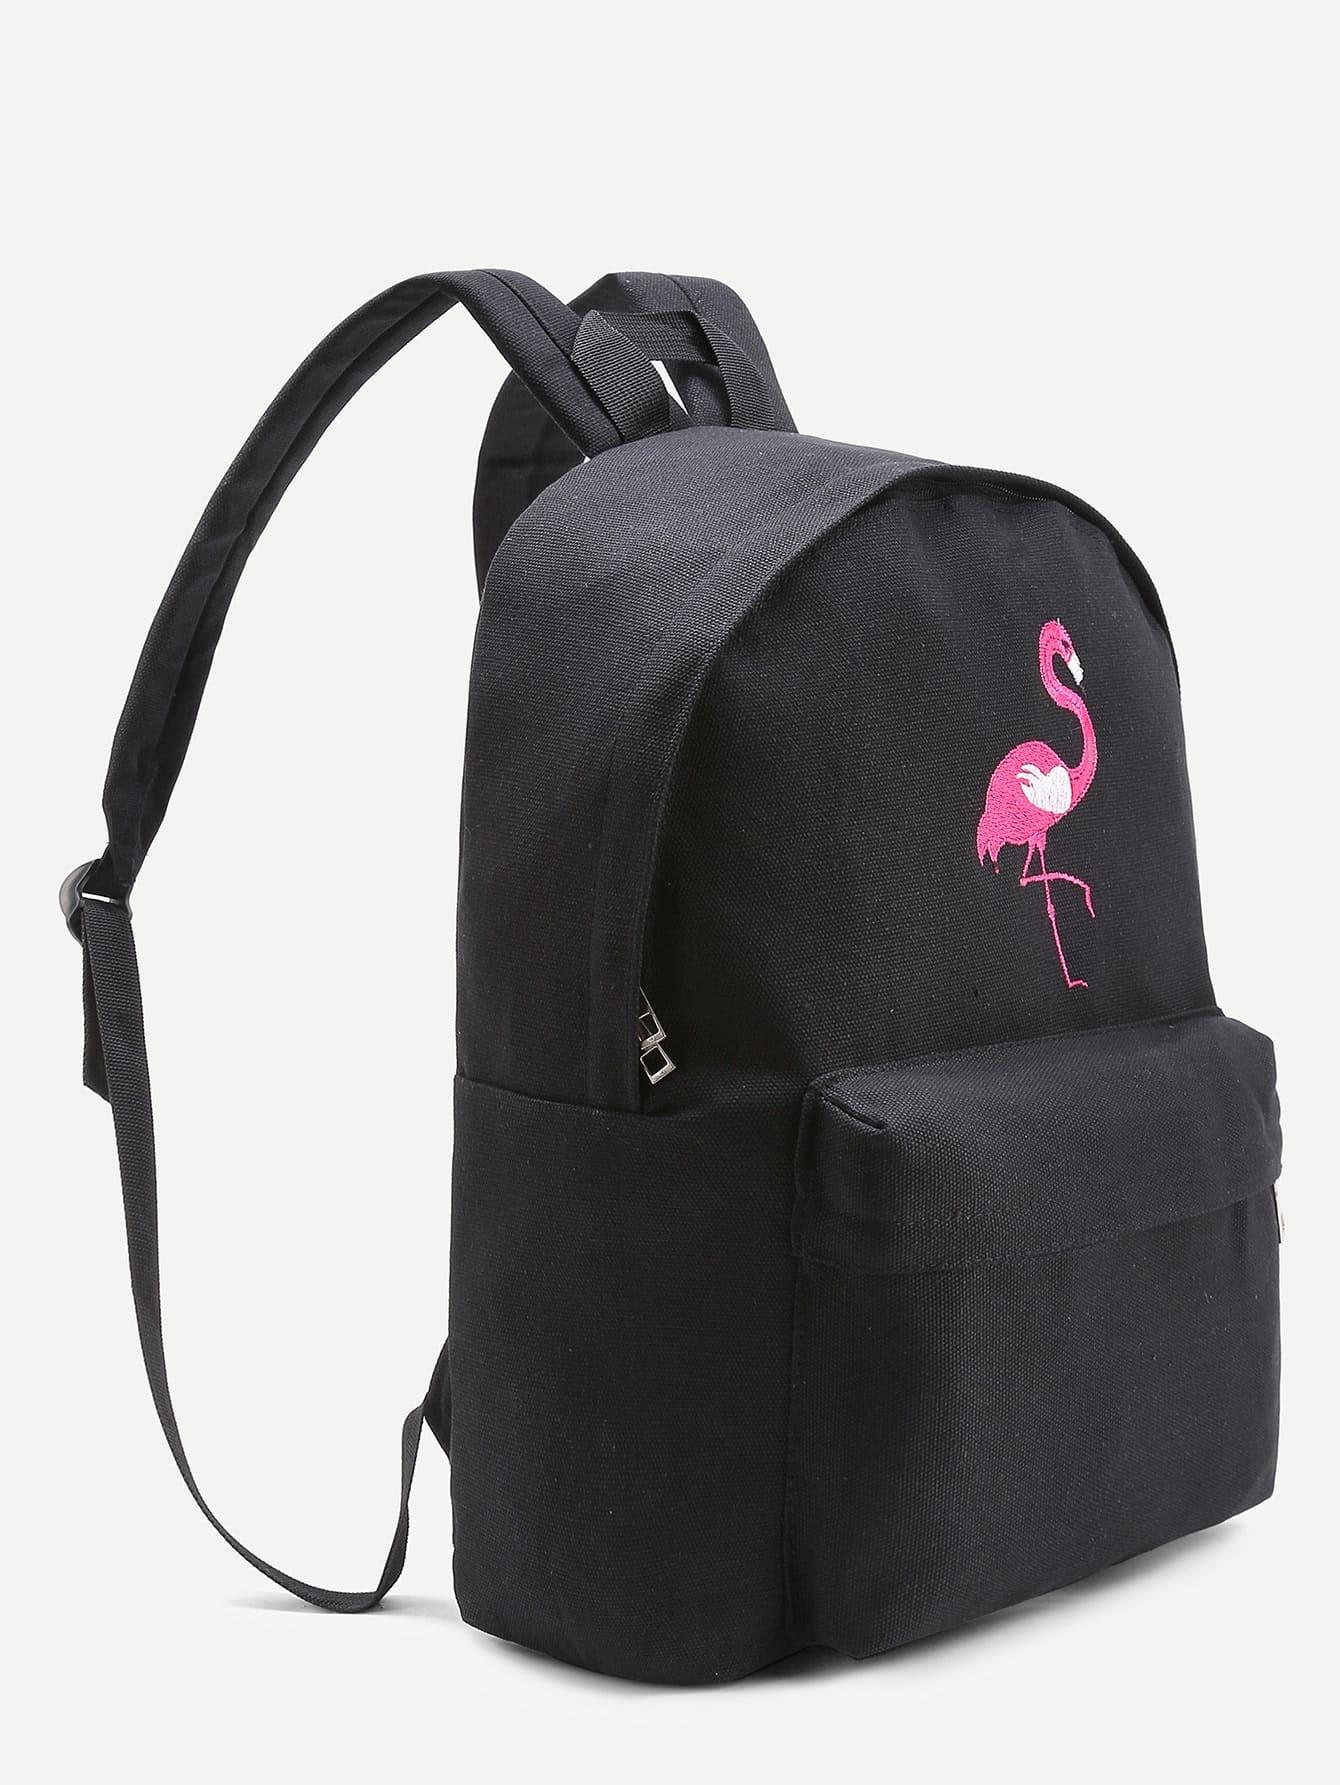 bag170509316_1